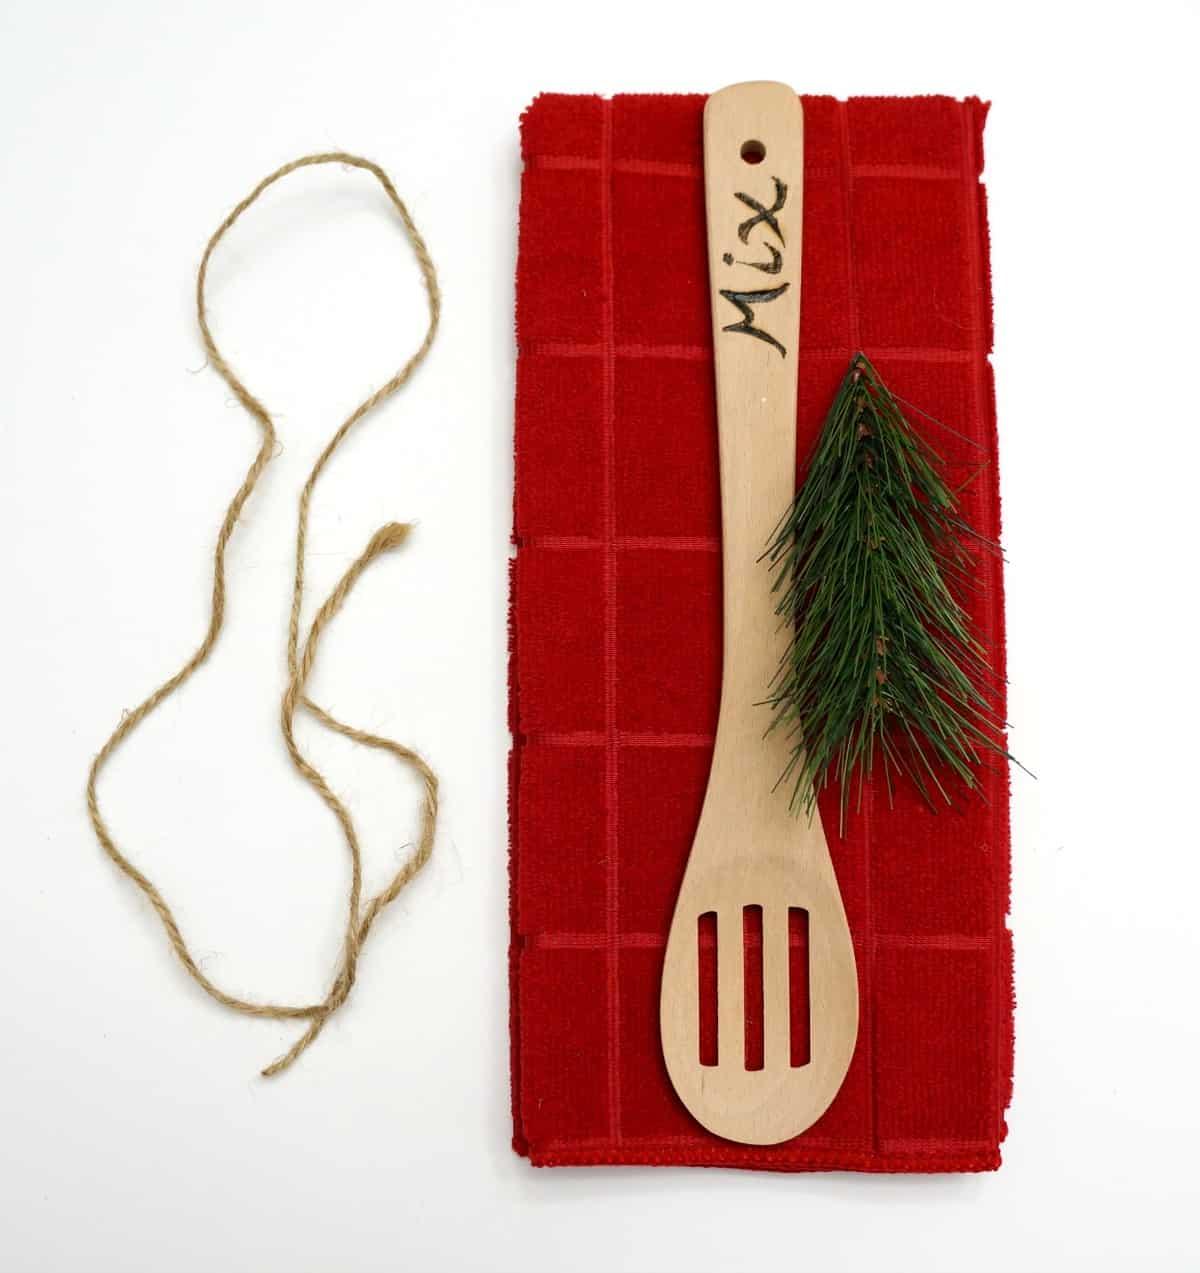 A simple wood burned hostess gift